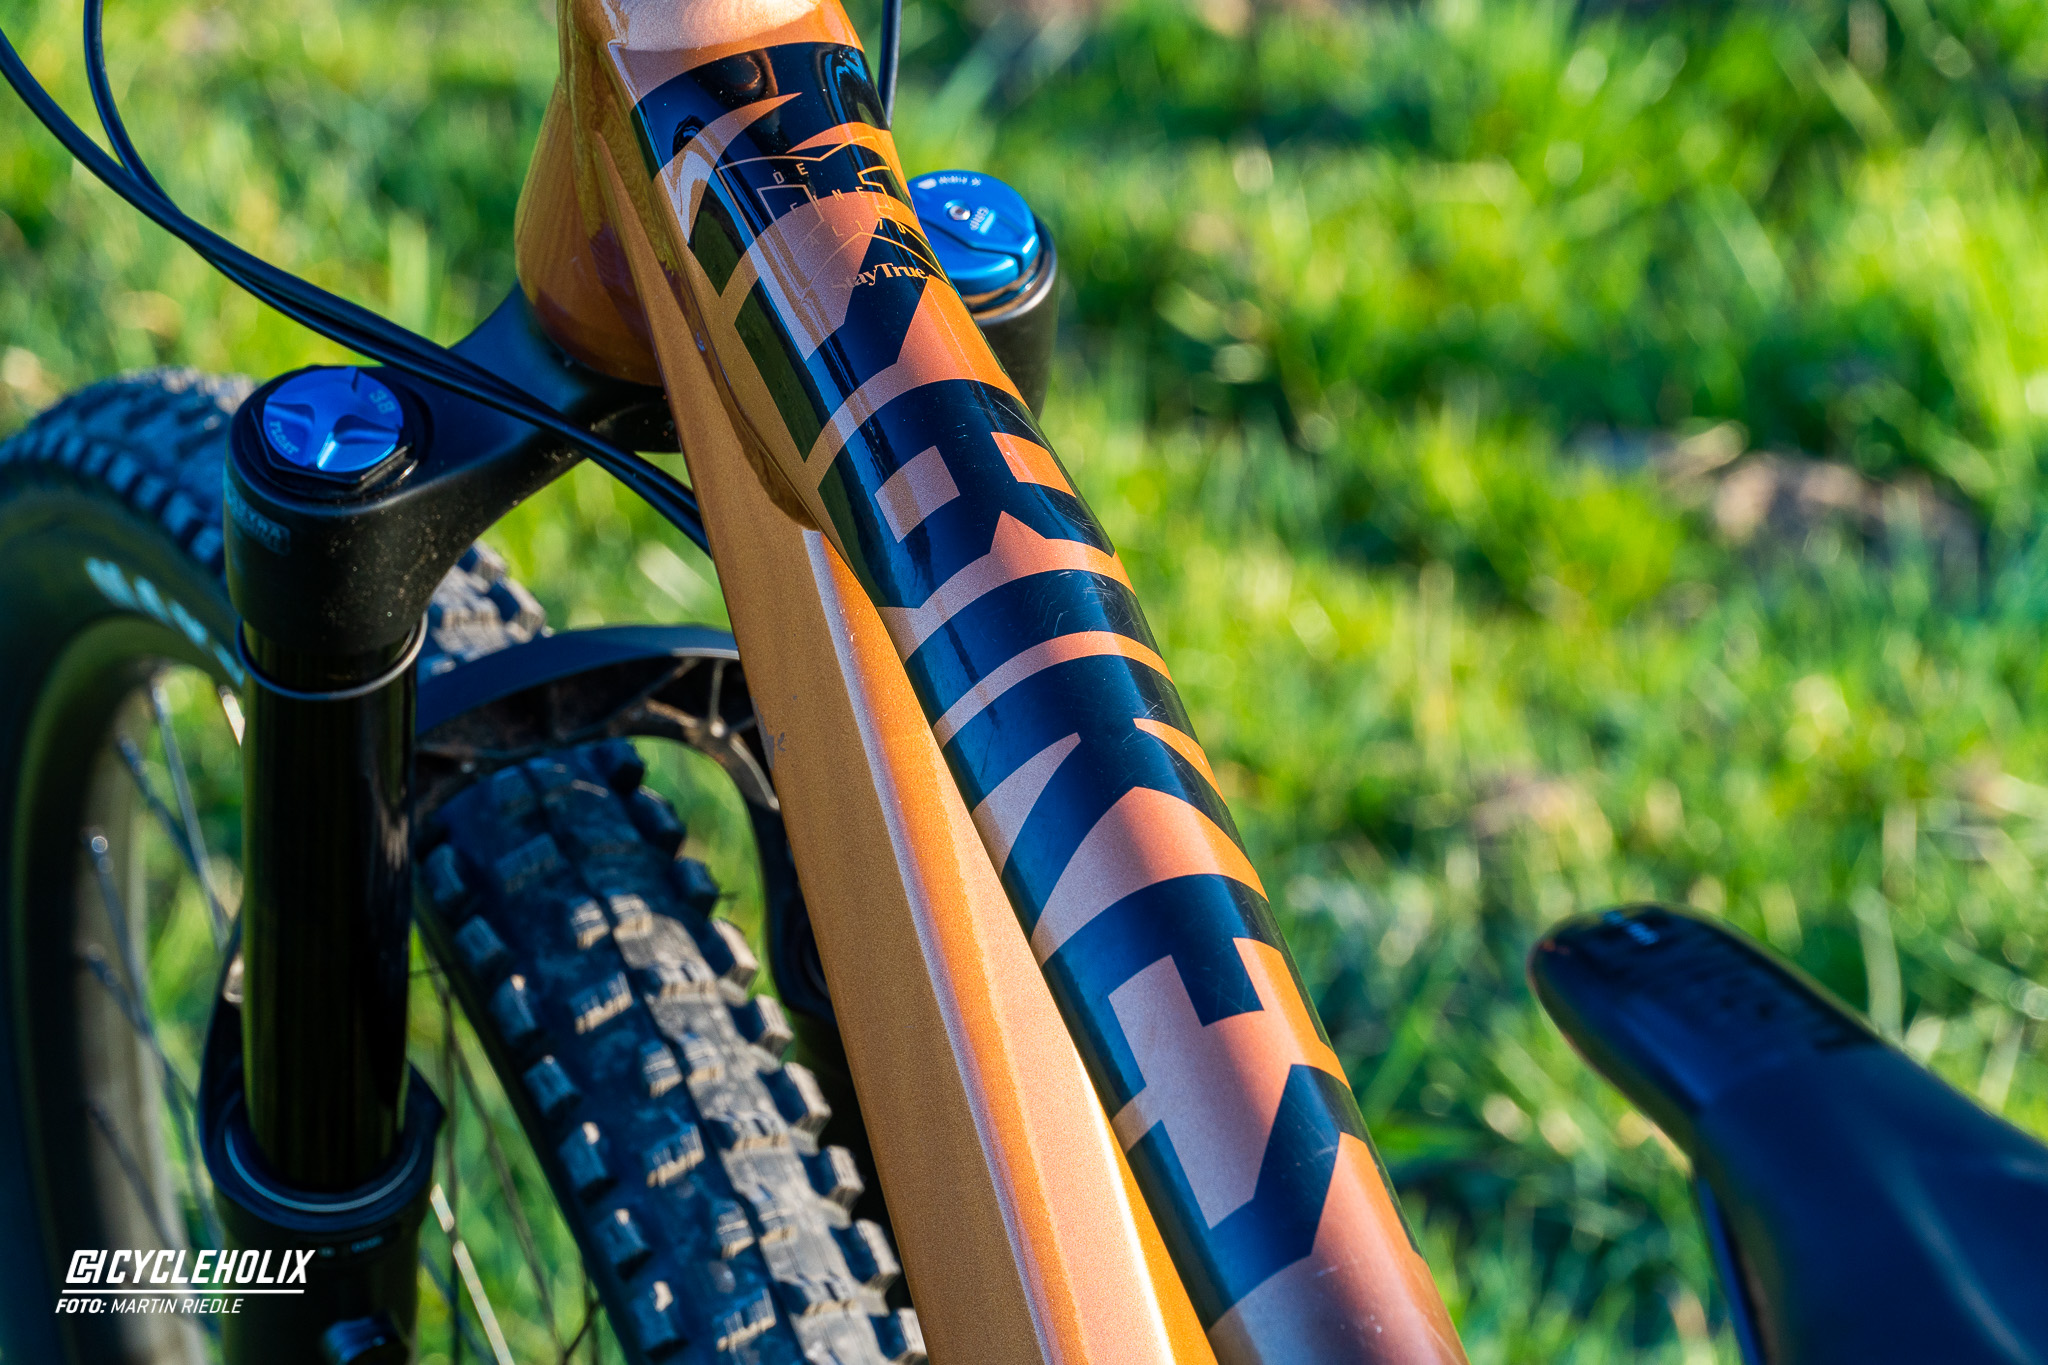 2021 NS Bikes Define 170 8 Cycleholix